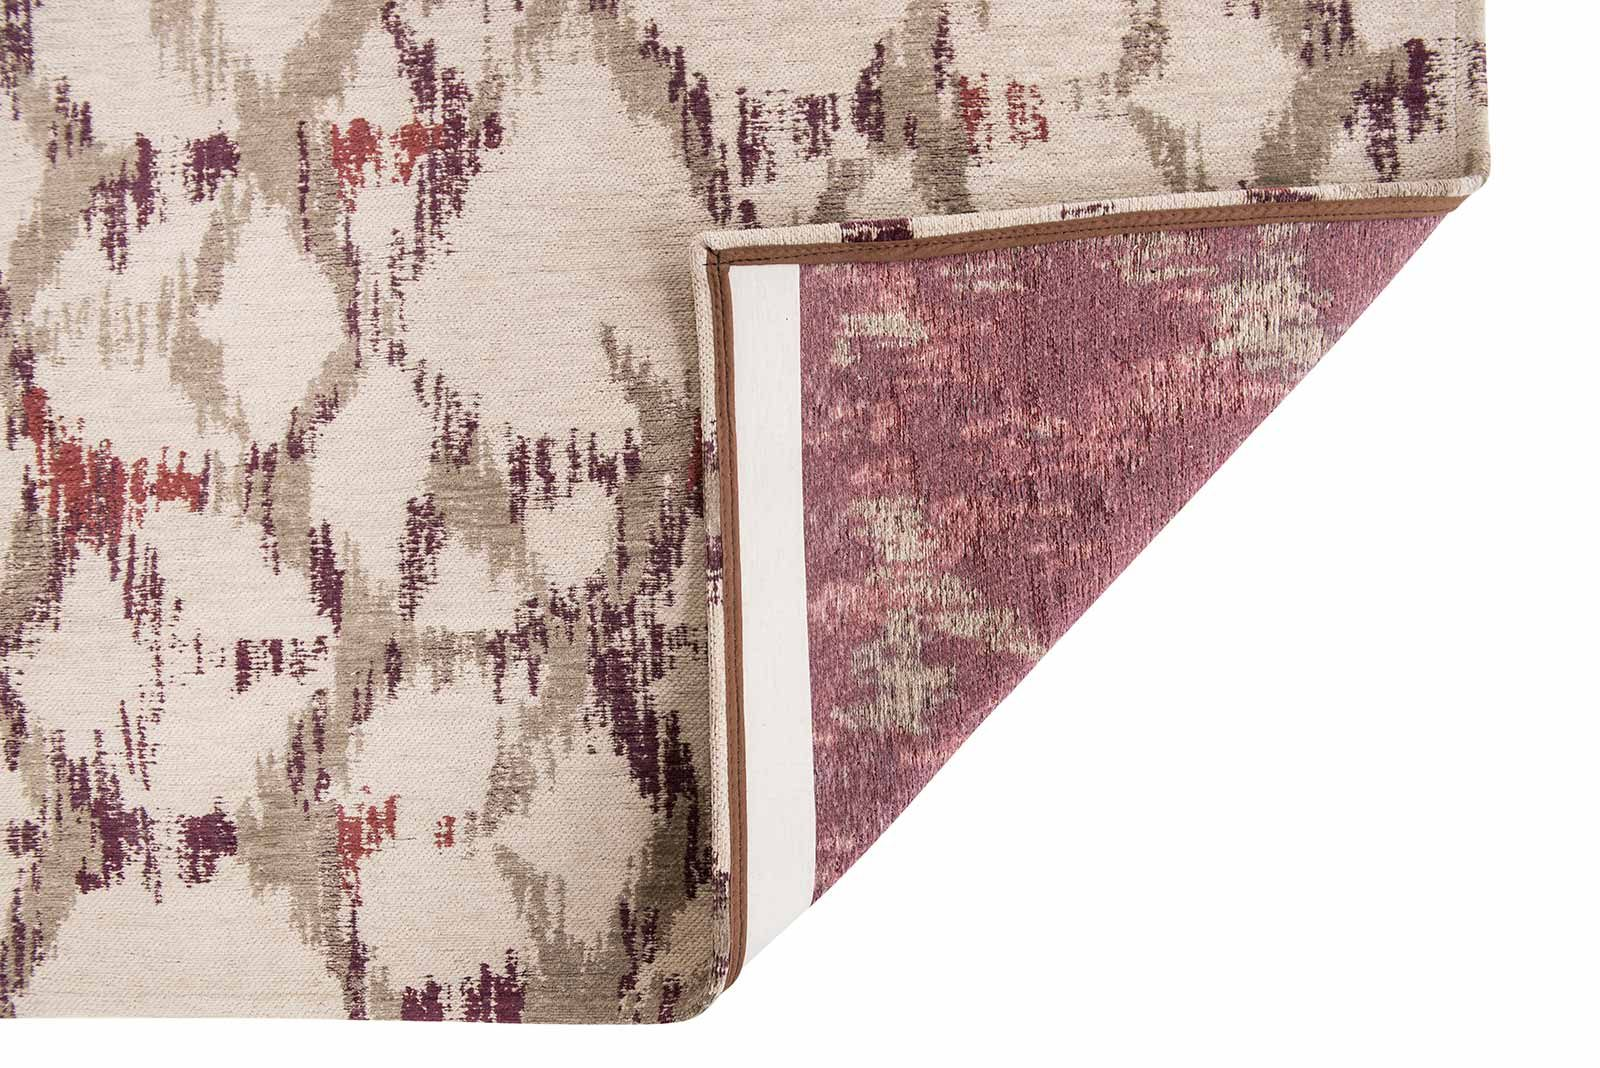 Louis De Poortere alfombras Villa Nova LX 8752 Sudare Jewel back